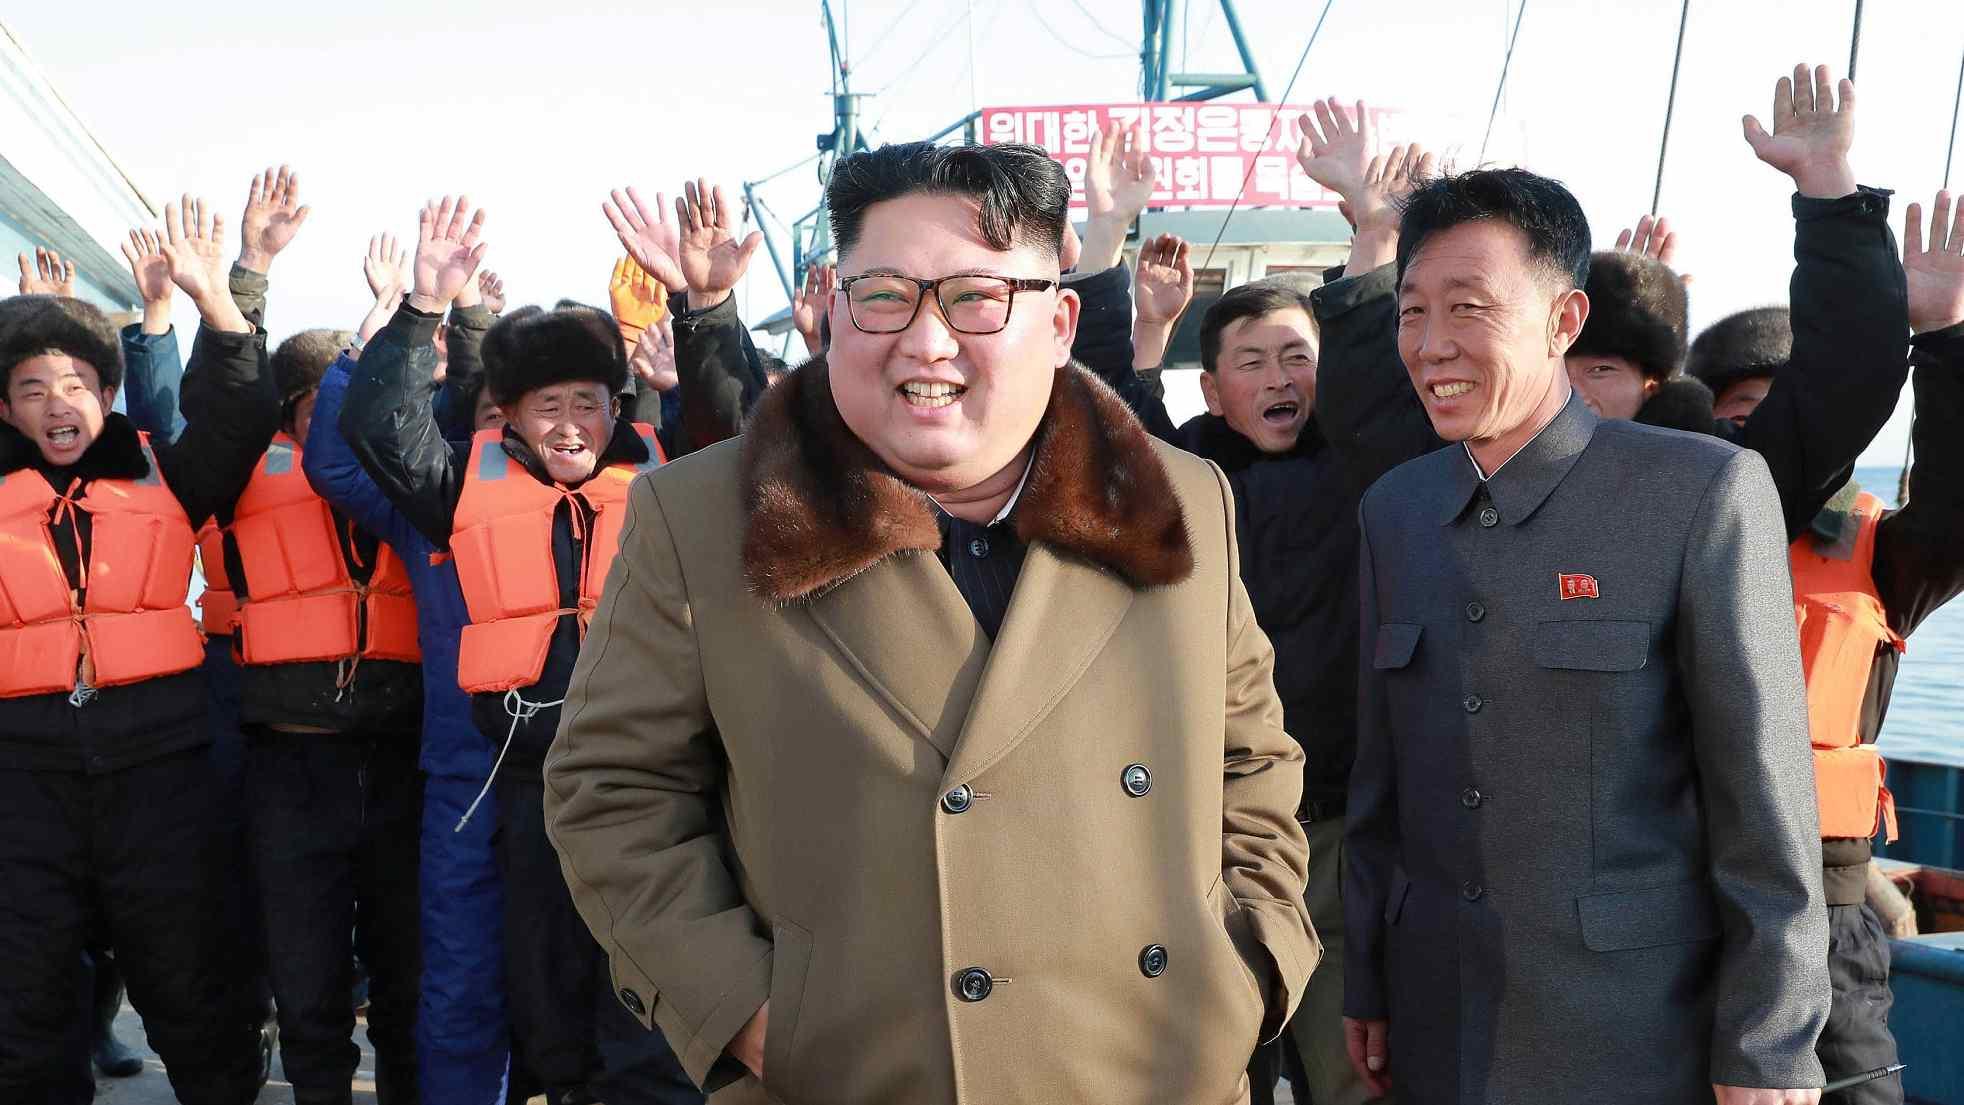 Kim Jong-un shifts gears towards the economy